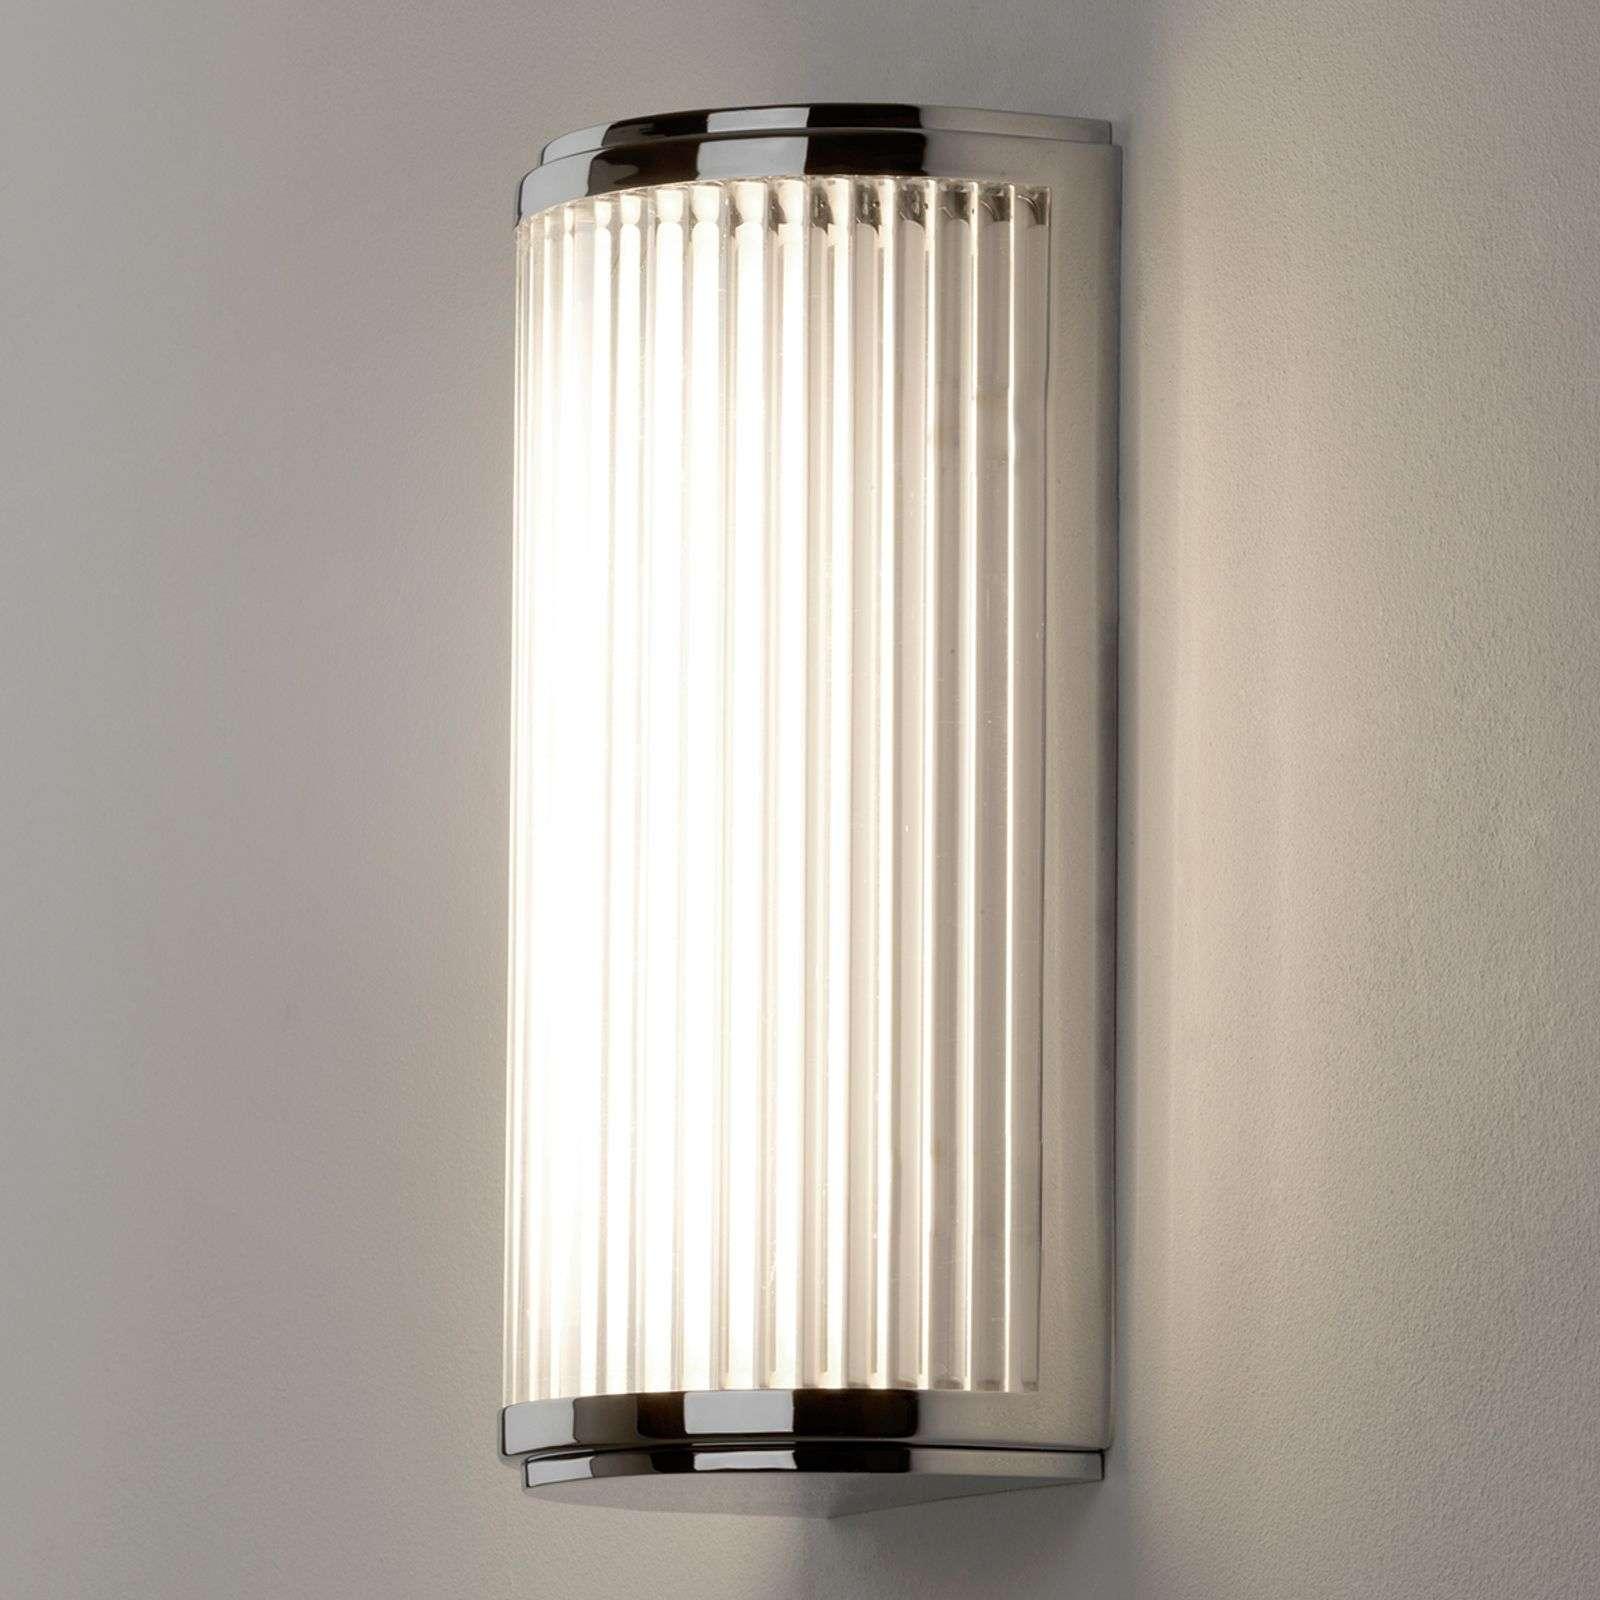 Astro Essenziale applique LED scanalata Versailles